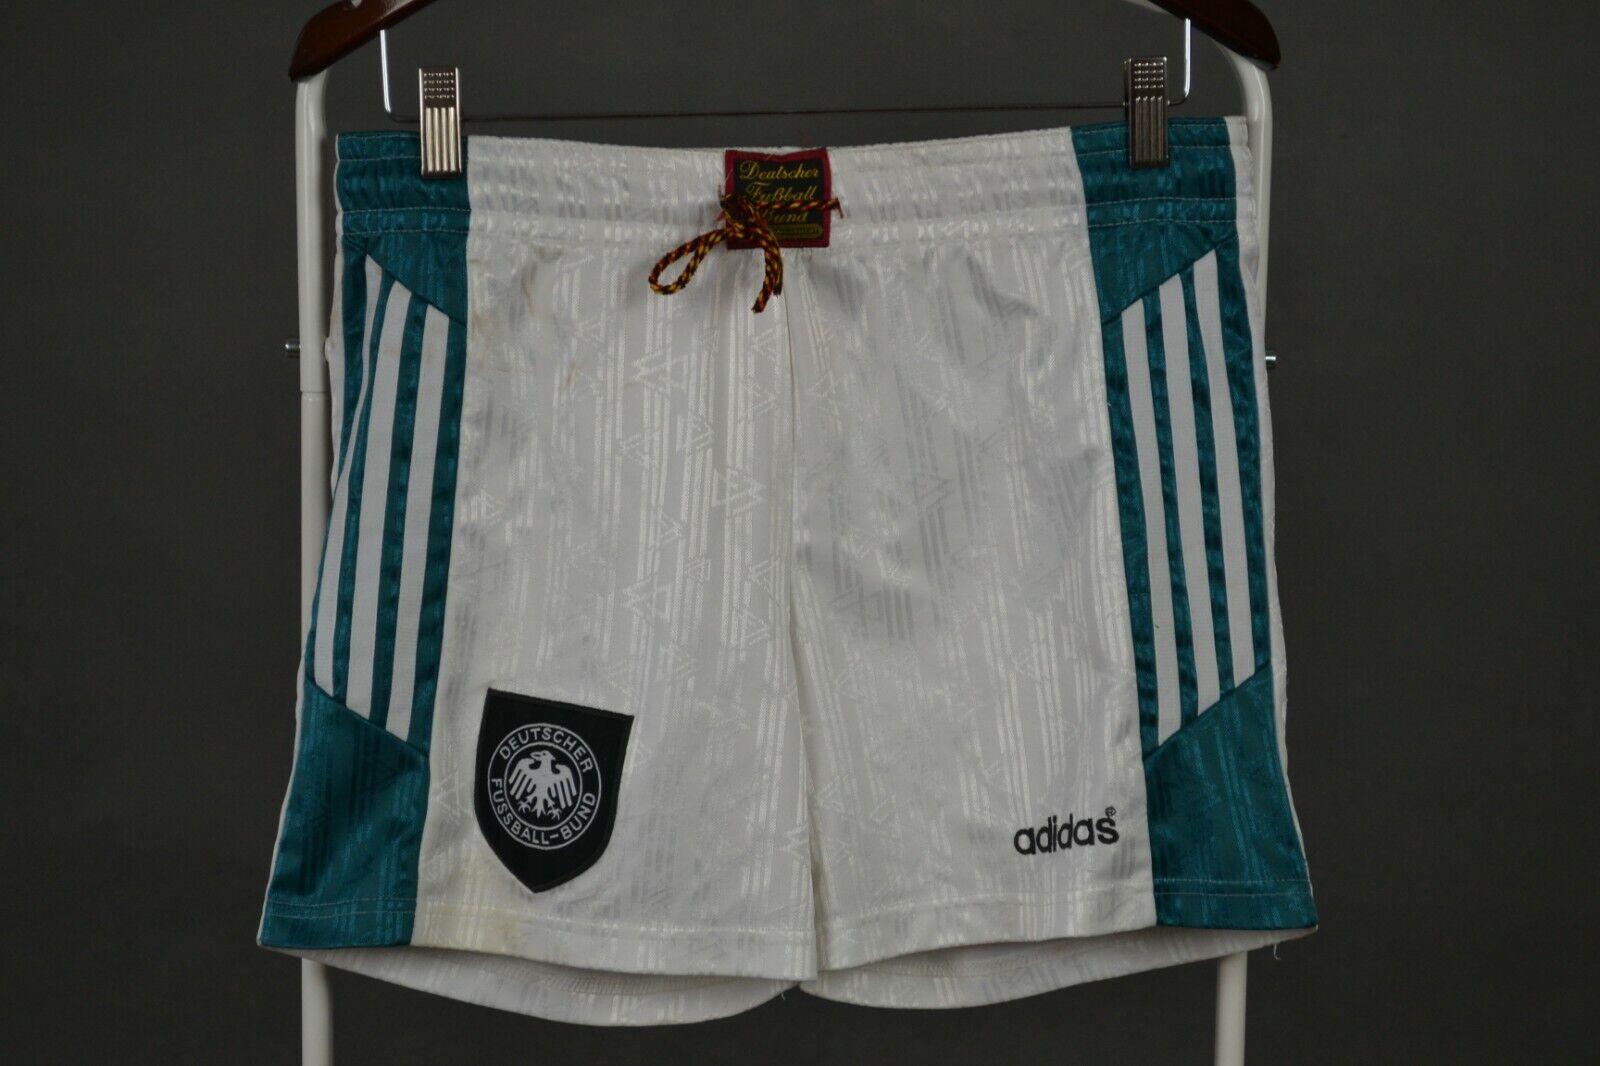 RARE Tyskland Home 1996 1998 Adidas vit Vuxes S SMALL Shorts Football vintage